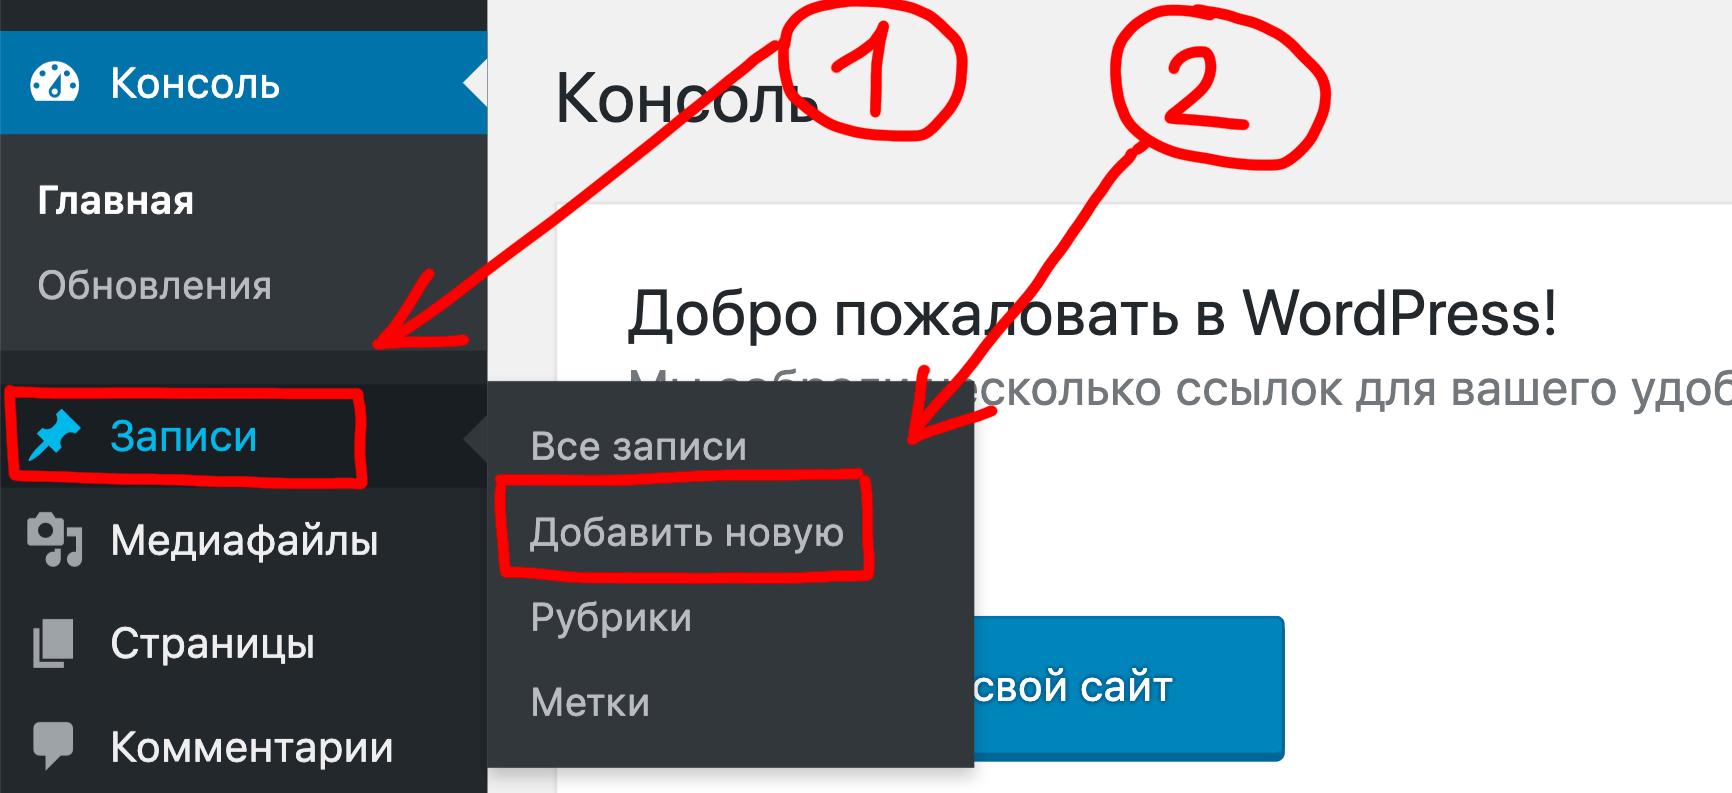 Как добавить запись в WordPress на ваш сайт